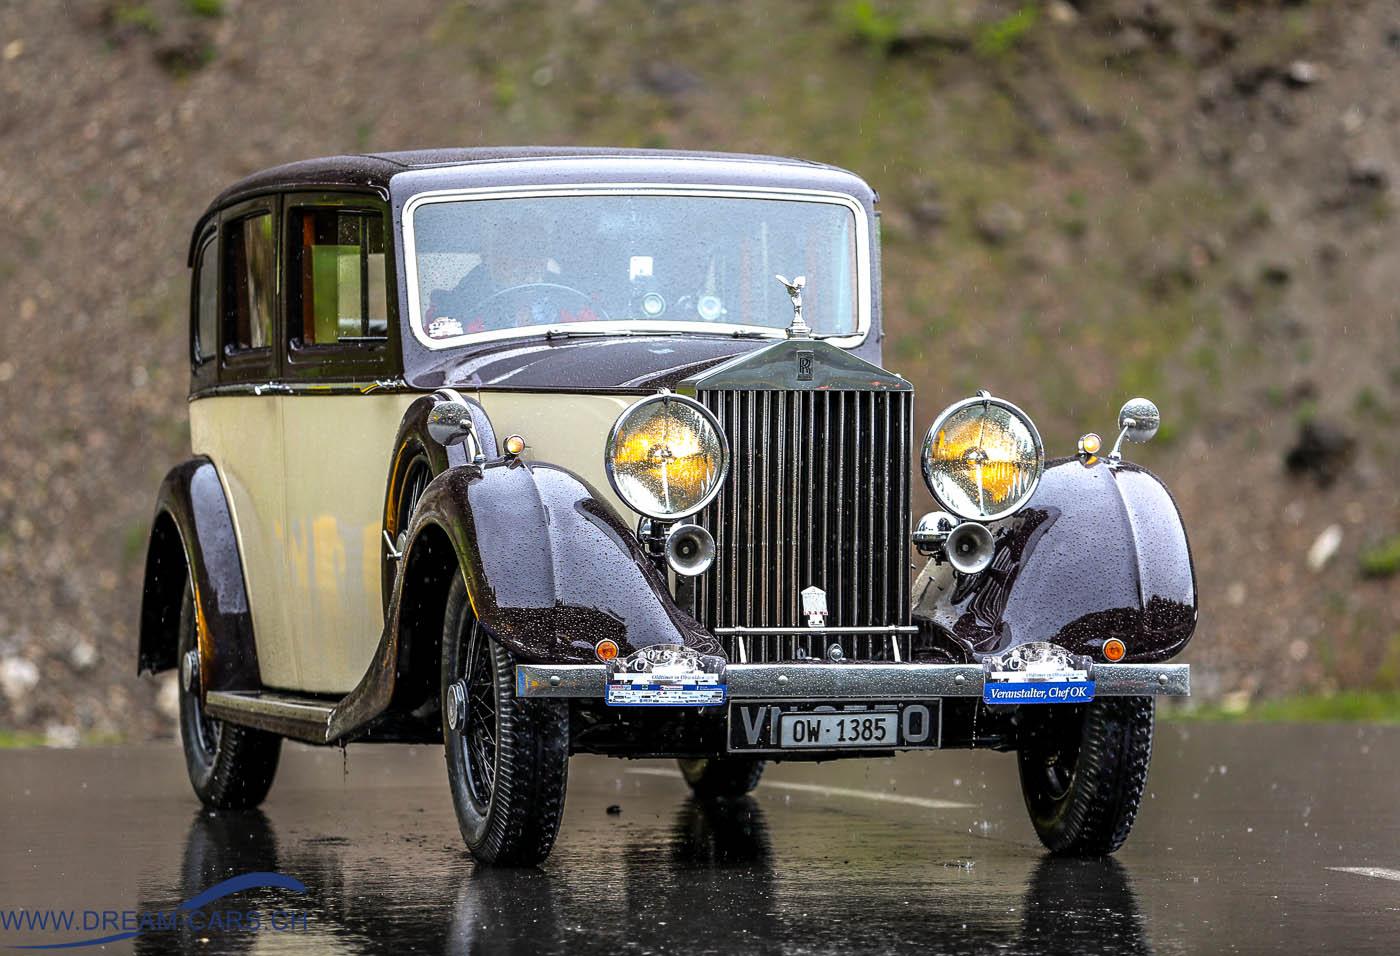 OiO - Oldtimer in Obwalden, Rolls Royce Ruedi Müller, Eventcenter Seelisberg